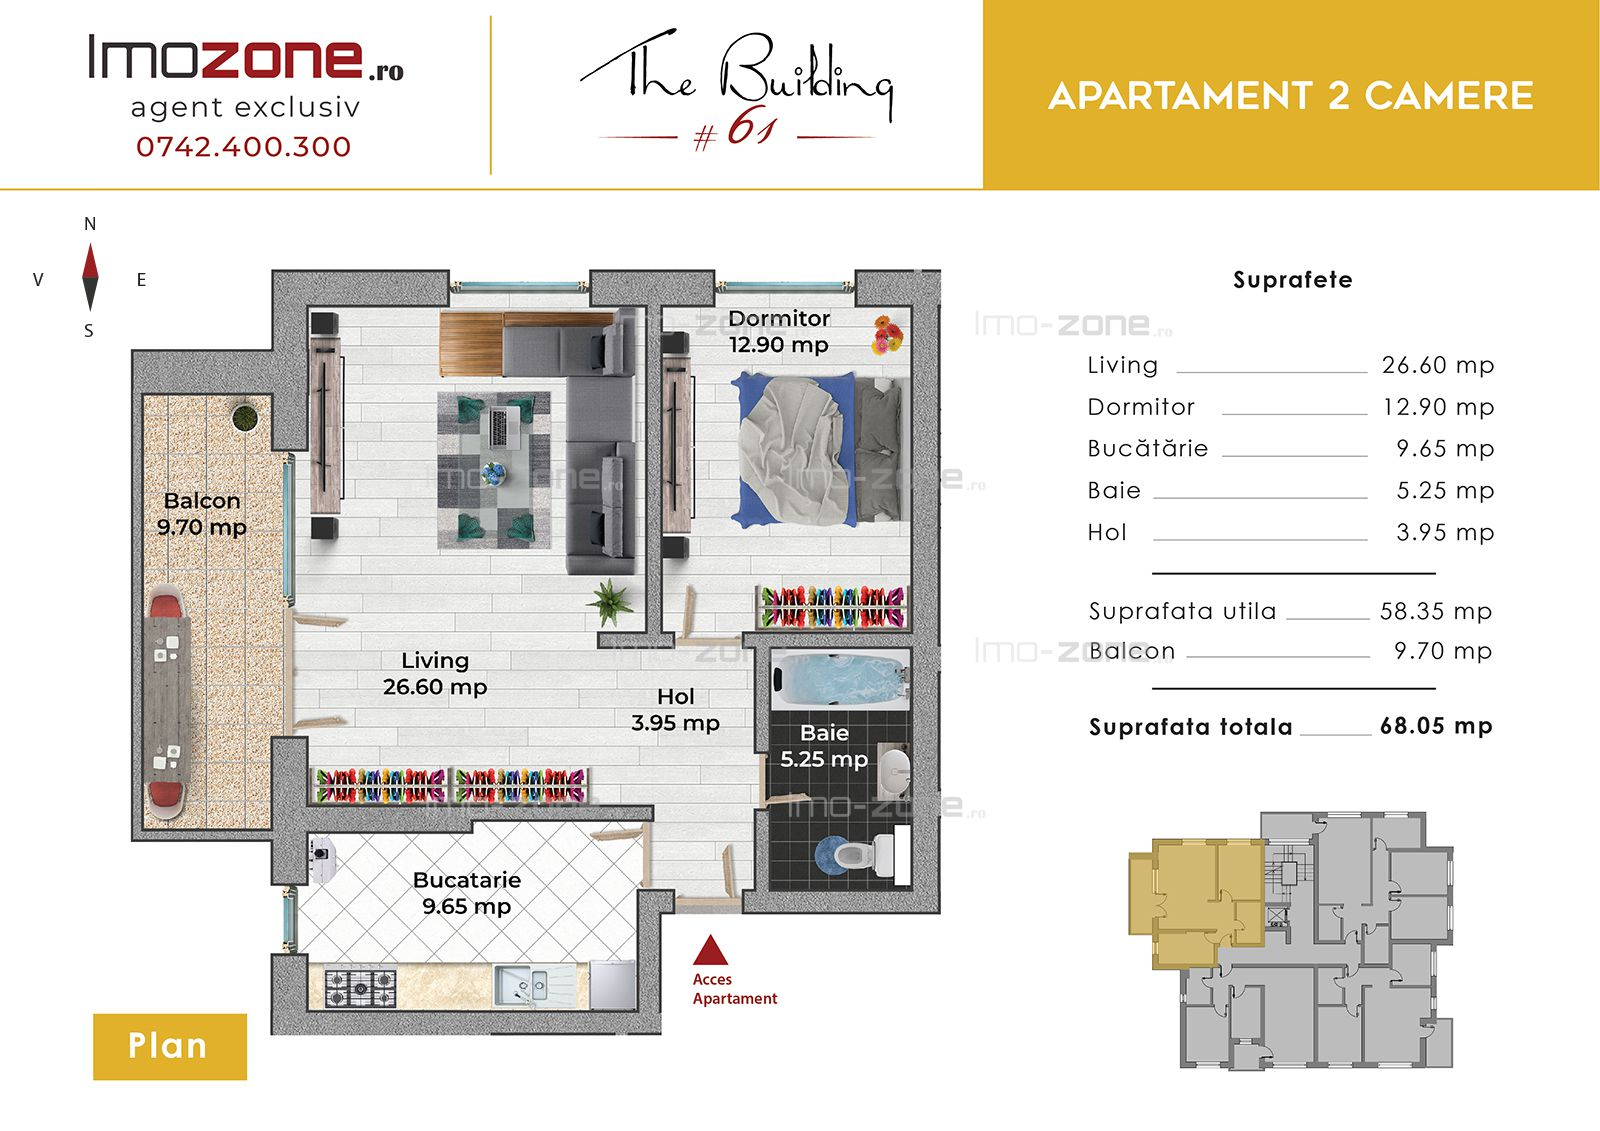 Apartament 2 camere, langa PLAZA MALL, decomandat, spatios, bucatarie inchisa